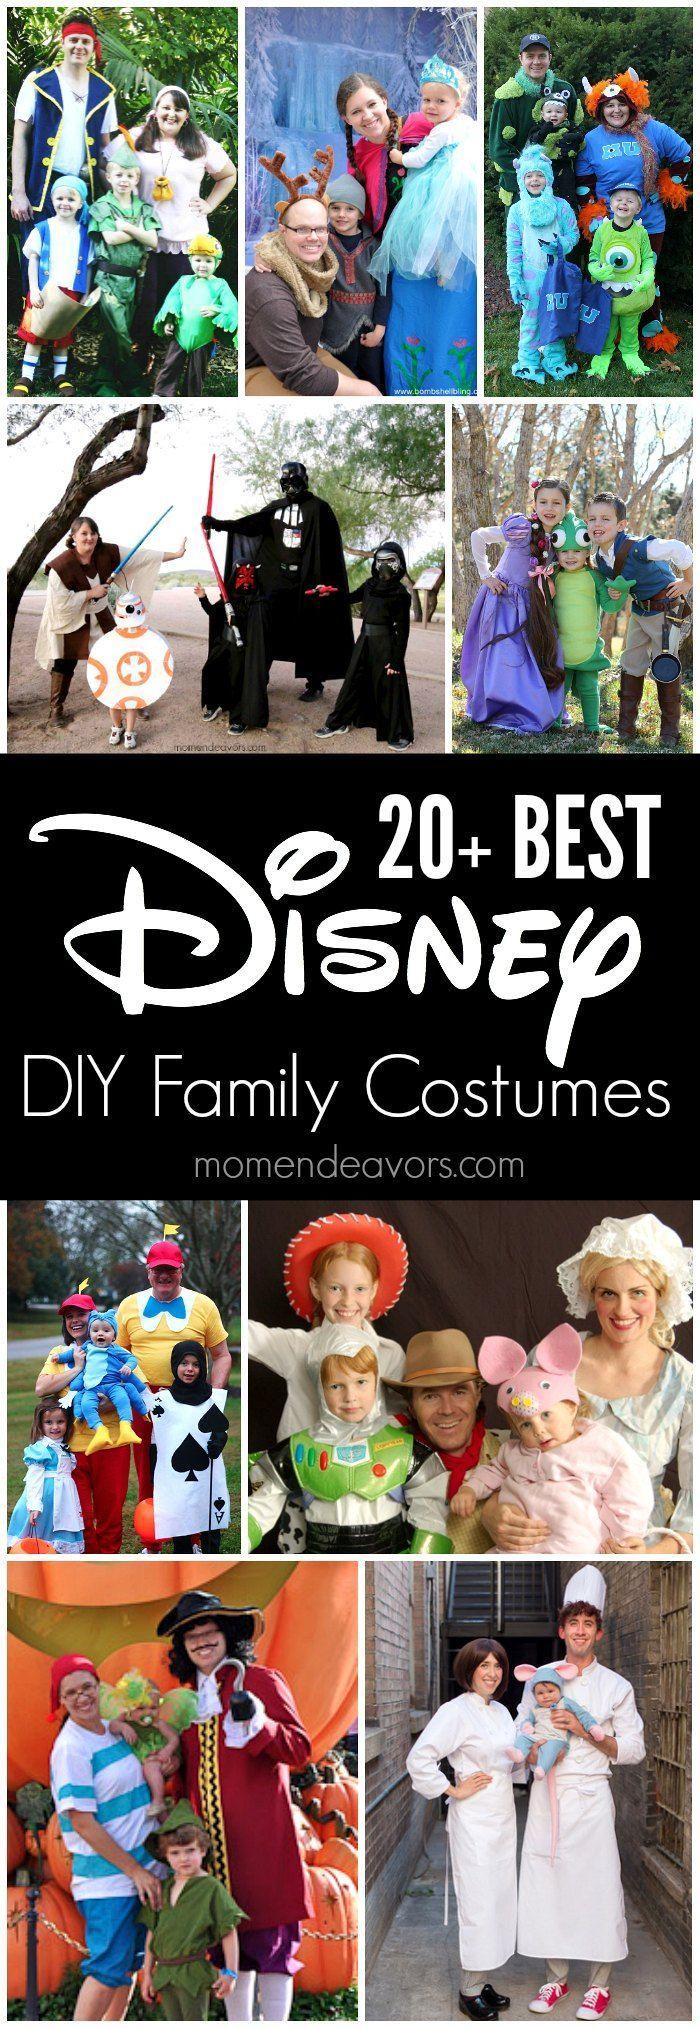 20+ BEST DIY Disney Family Themed Halloween Costumes